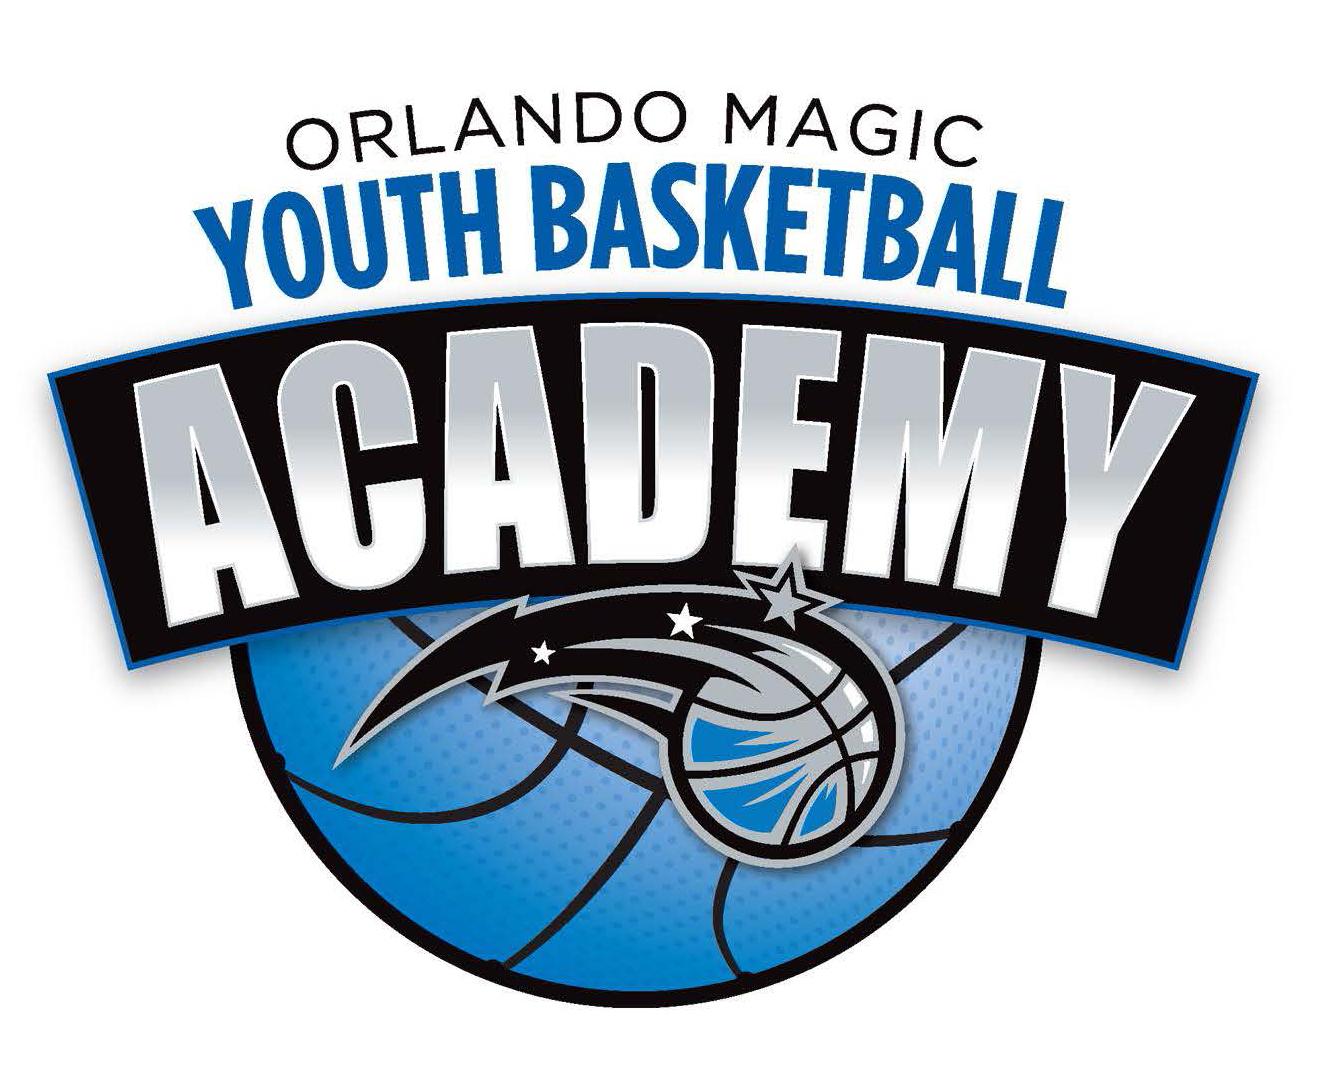 Tampa Youth Basketball Clinics